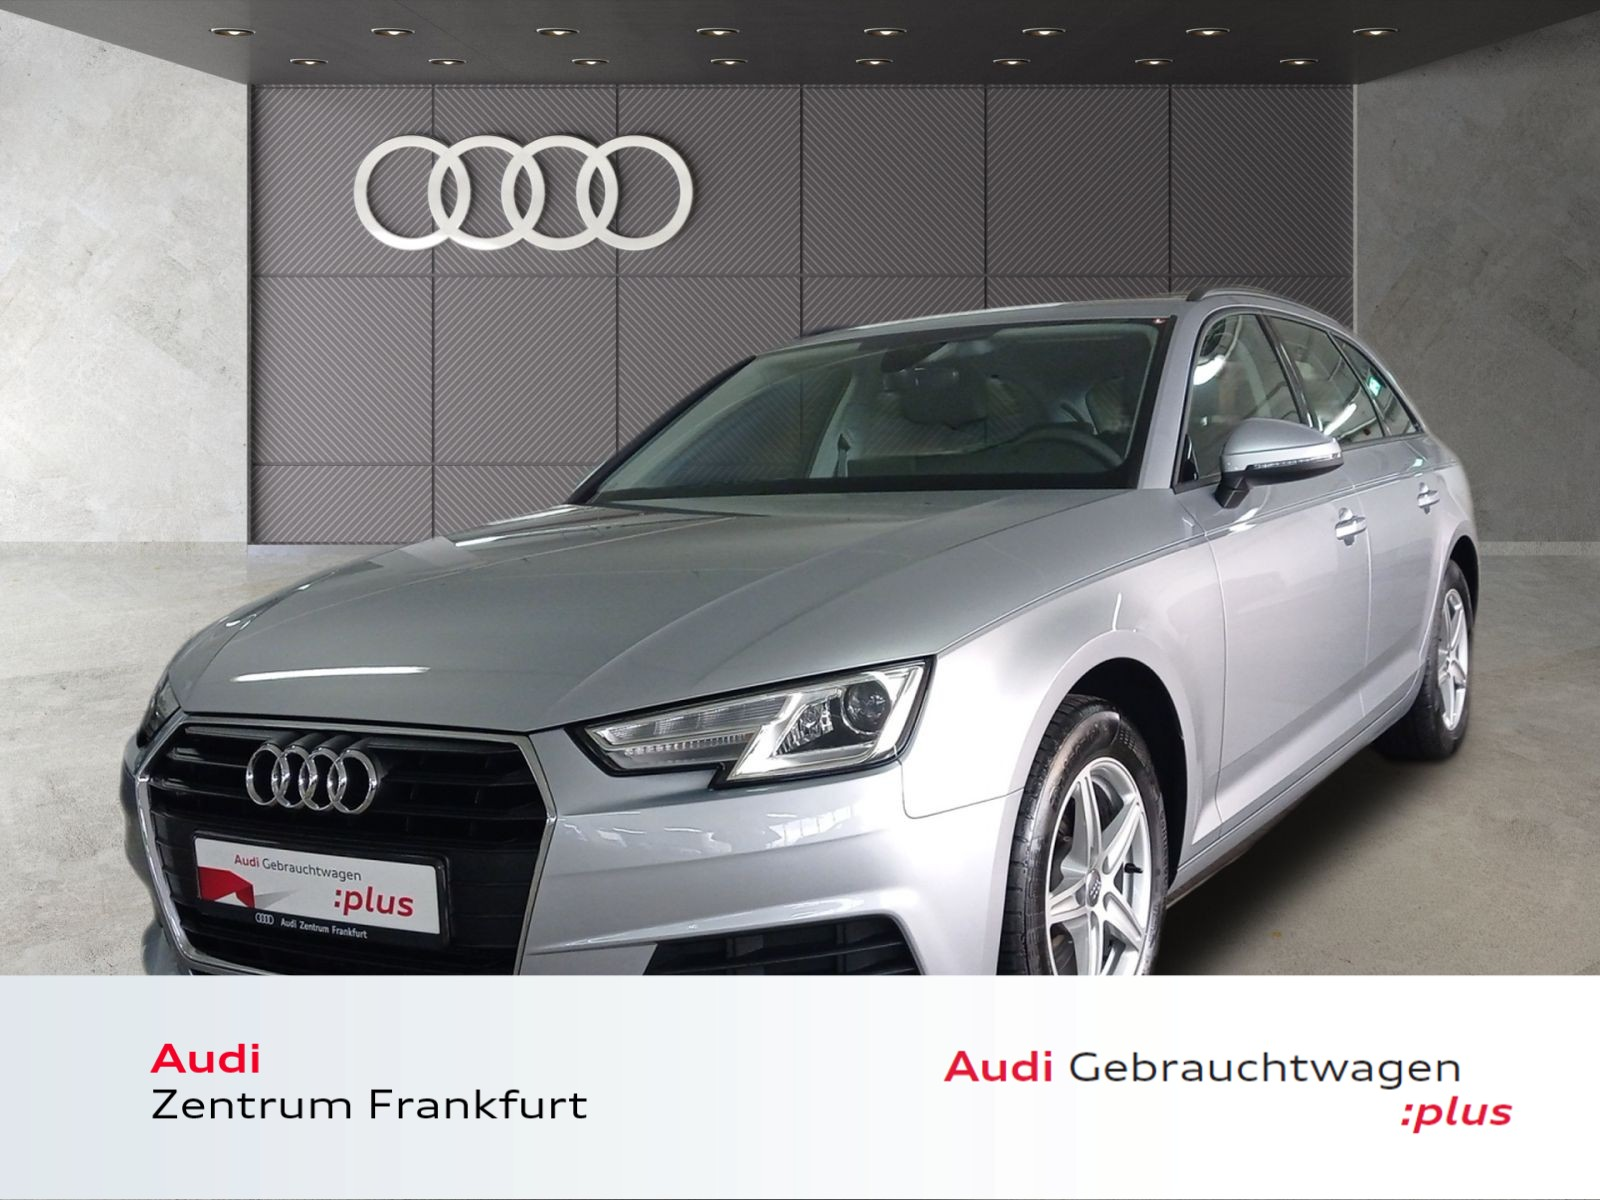 Audi A4 Avant 1.4 TFSI Navi Xenon Tempomat PDC Sitzheizung, Jahr 2018, Benzin